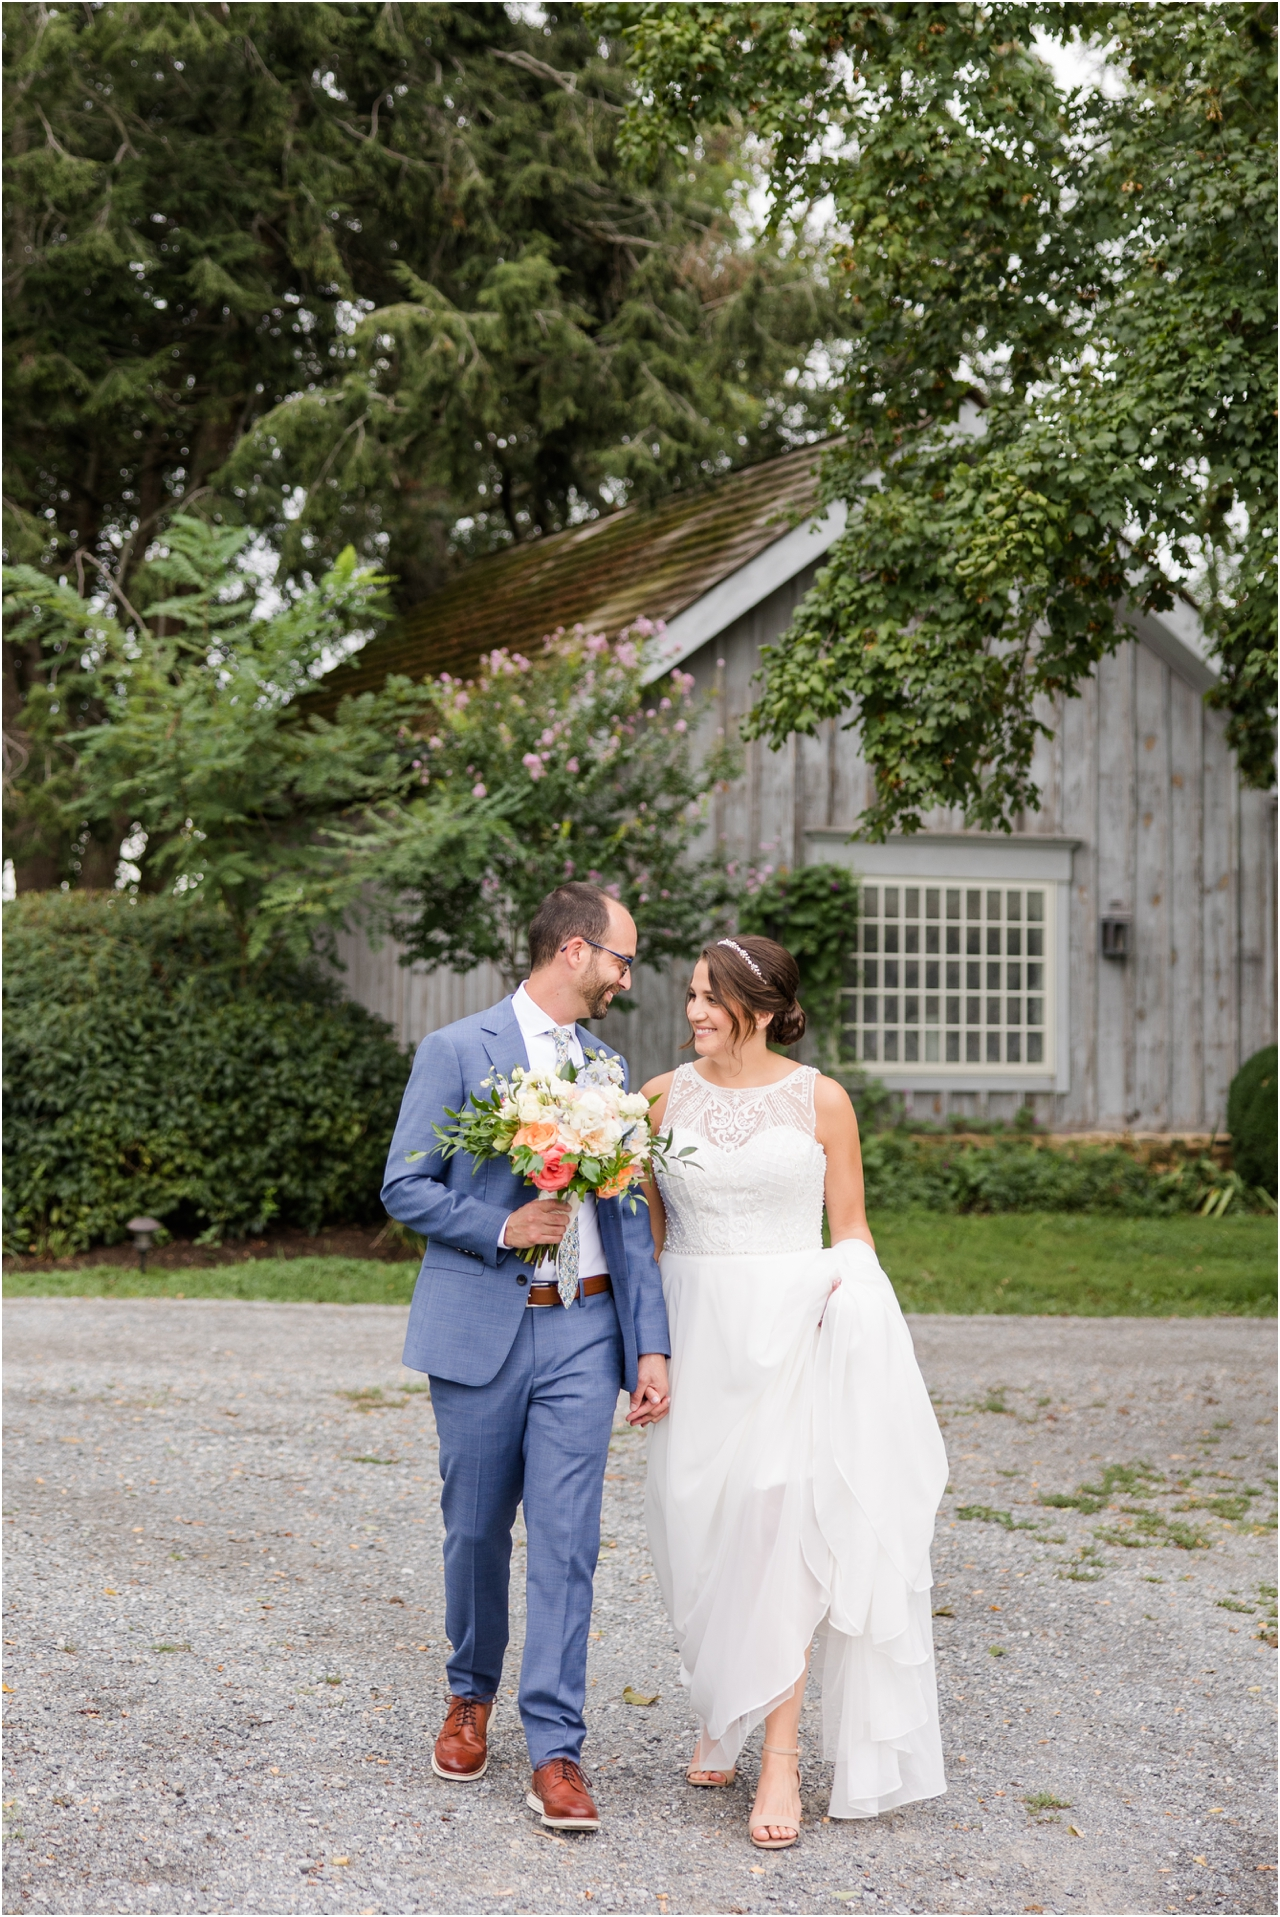 Sylvanside_Farm_Wedding_001